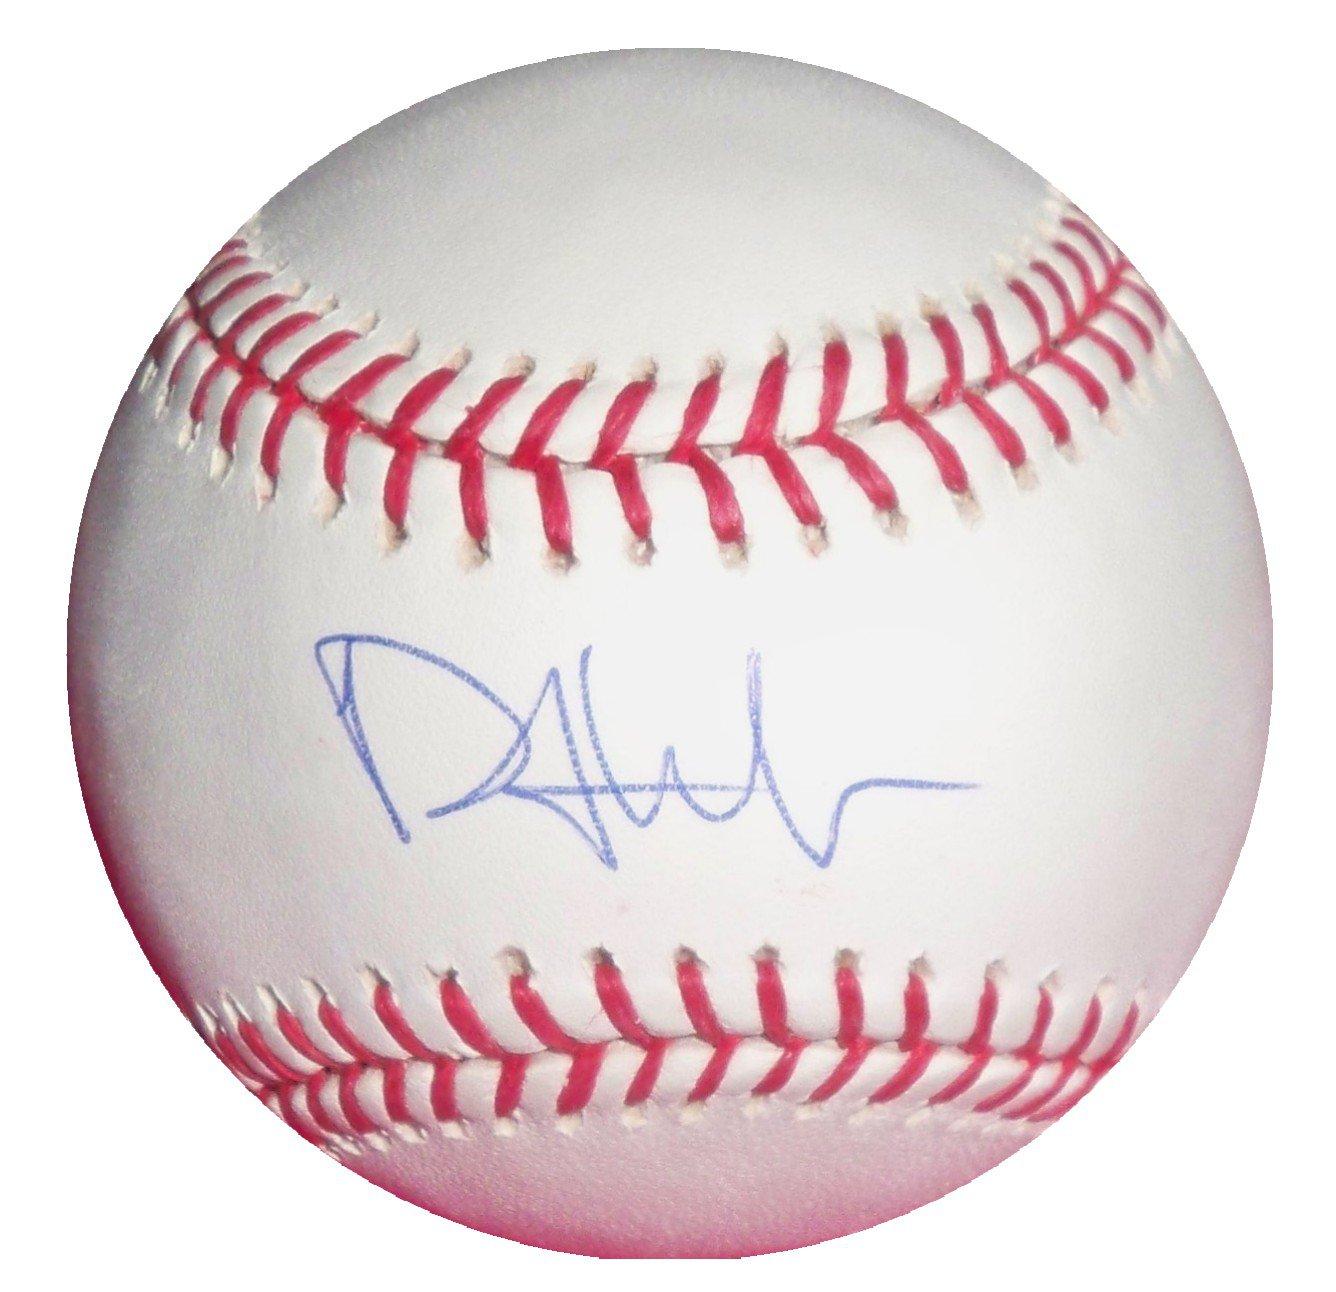 Phil Hughes Signed Official Major League Baseball (Steiner)